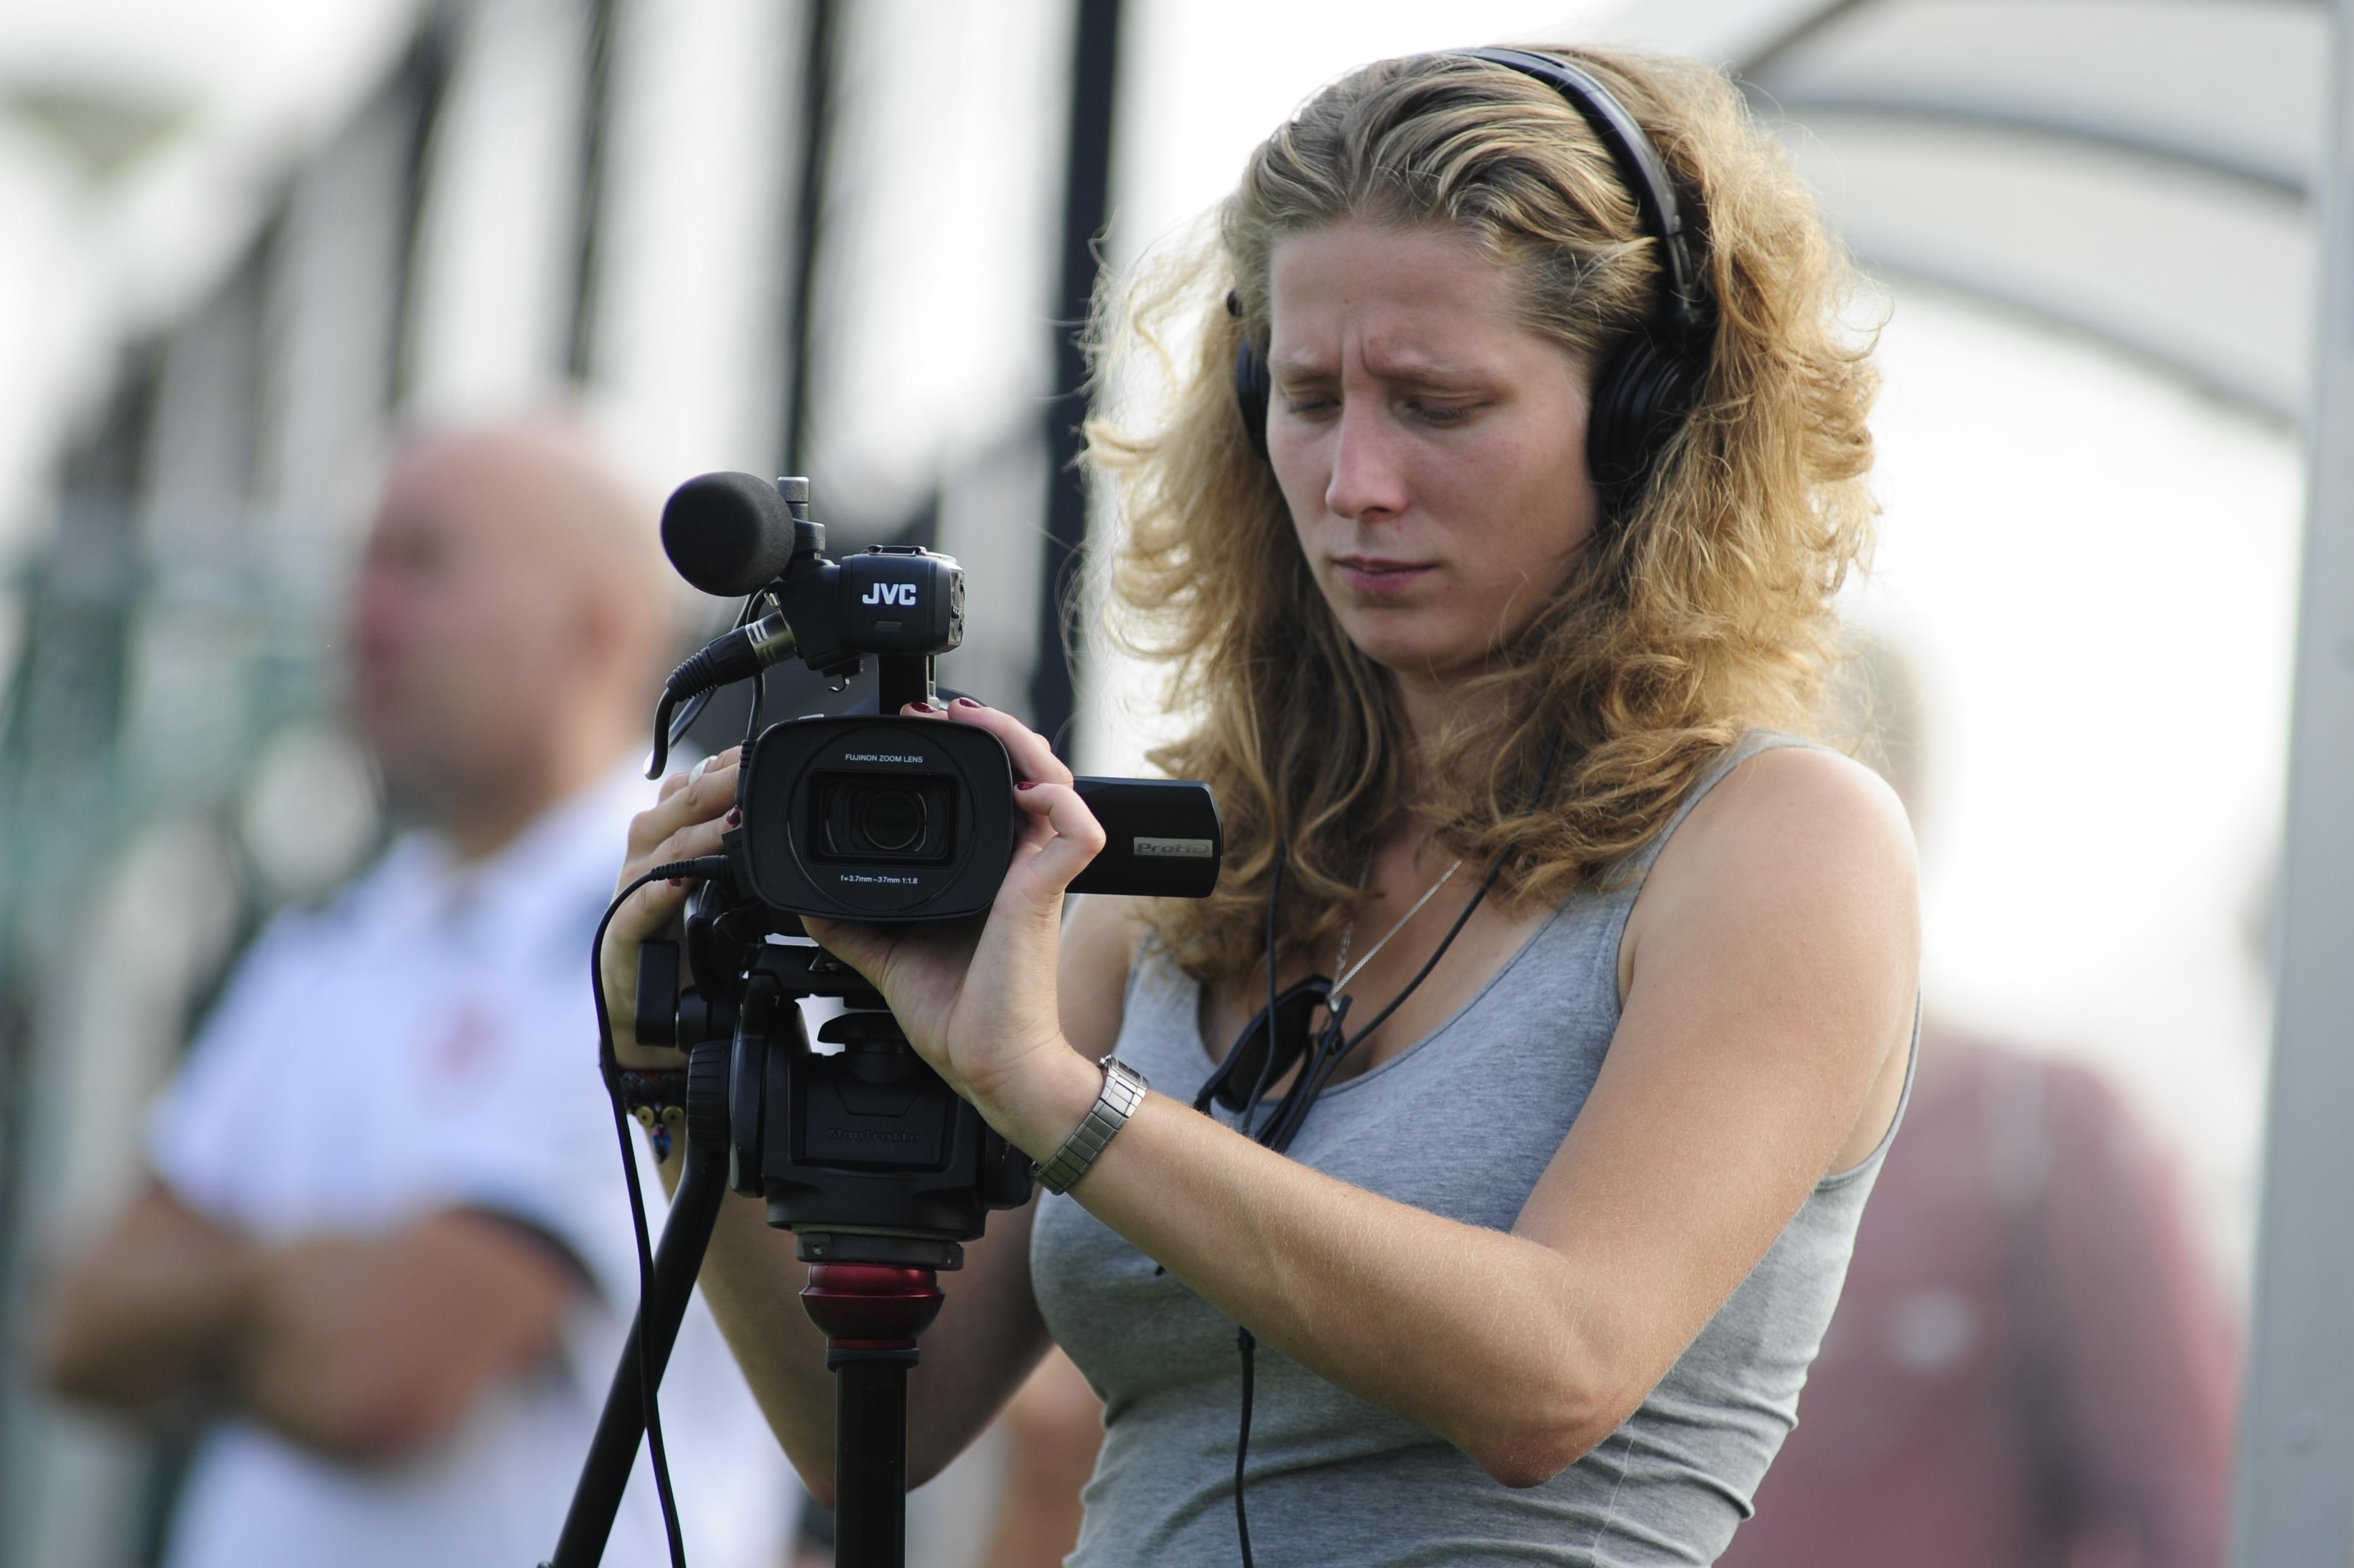 Promotie film Utrechtse vrouwenvoetbal academie